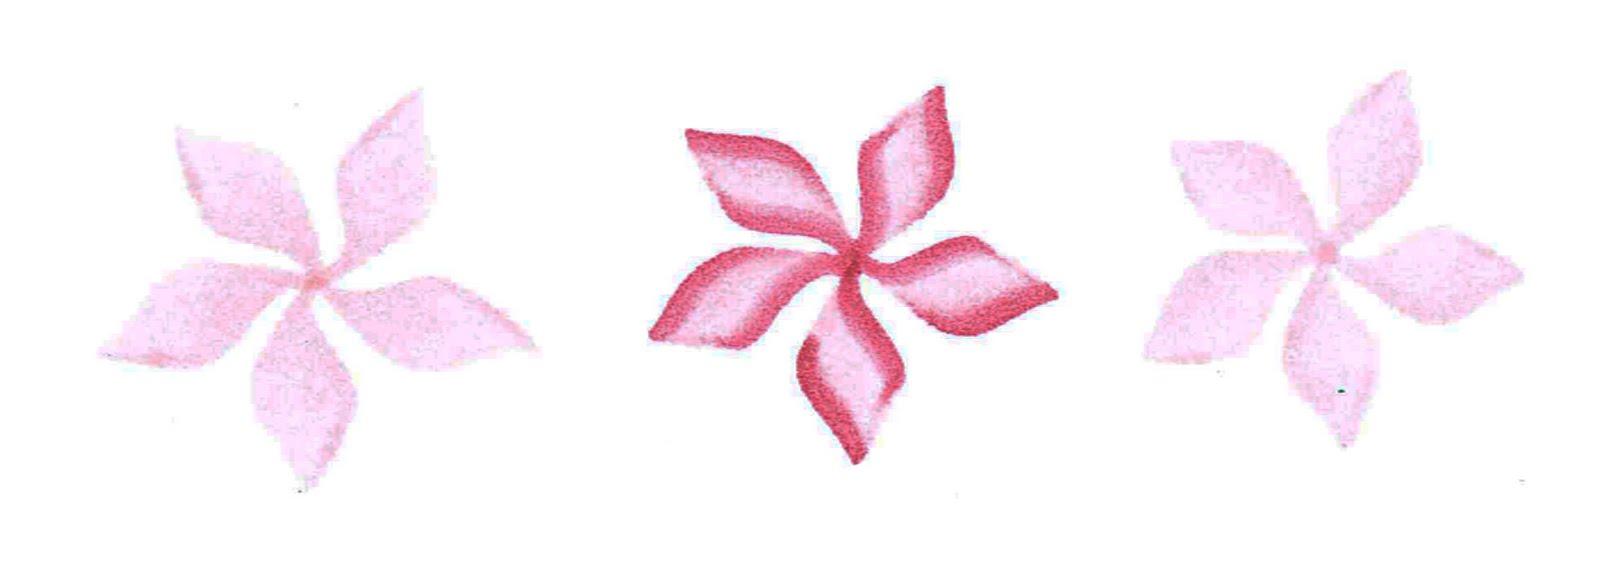 Kuretake Uk Blog Zig Calligraphy Markers The Basics